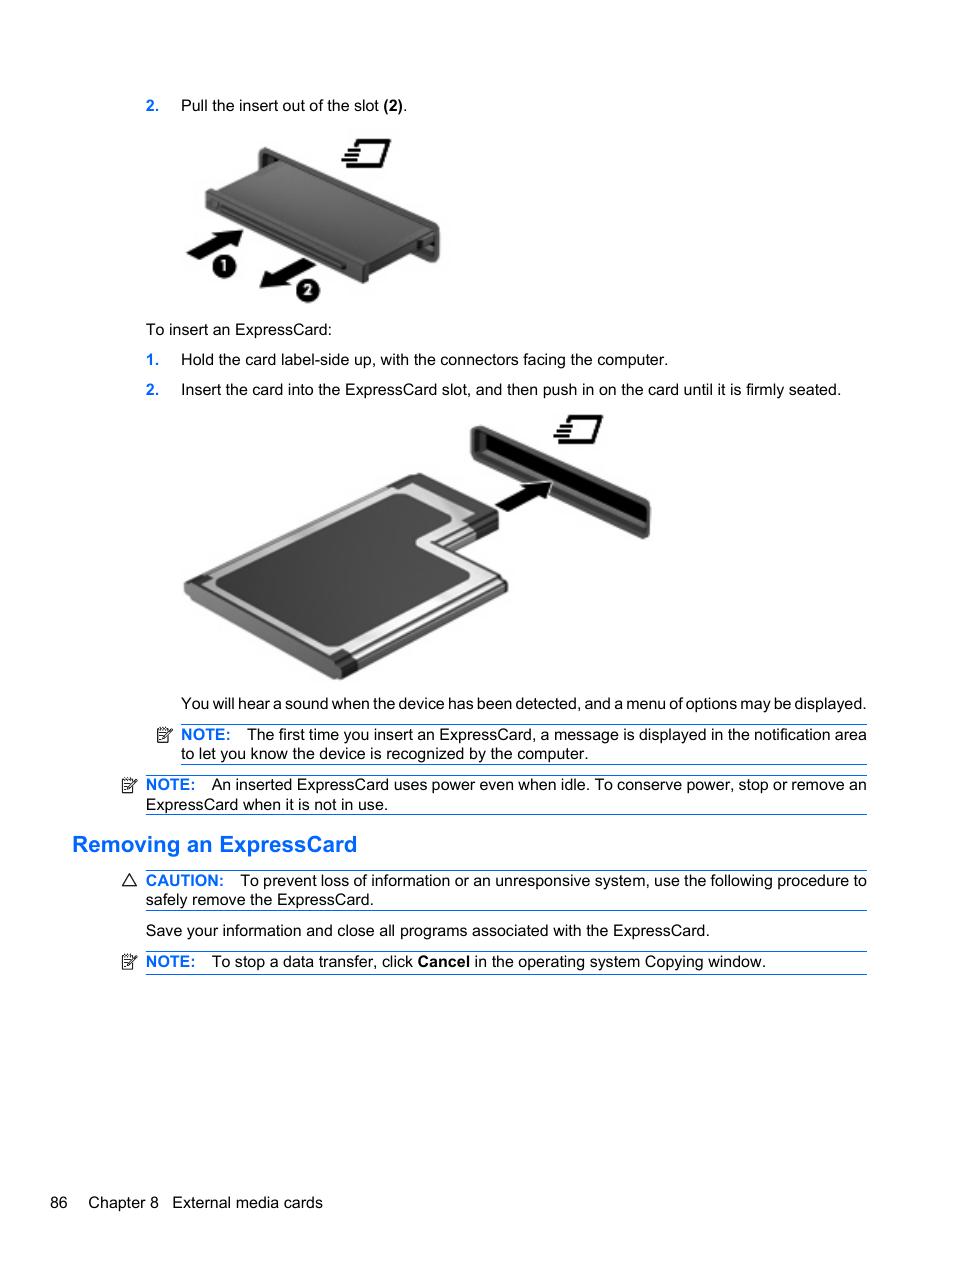 removing an expresscard hp elitebook 8740w mobile workstation user rh manualsdir com hp elitebook 8740w user manual hp elitebook 8740w owners manual